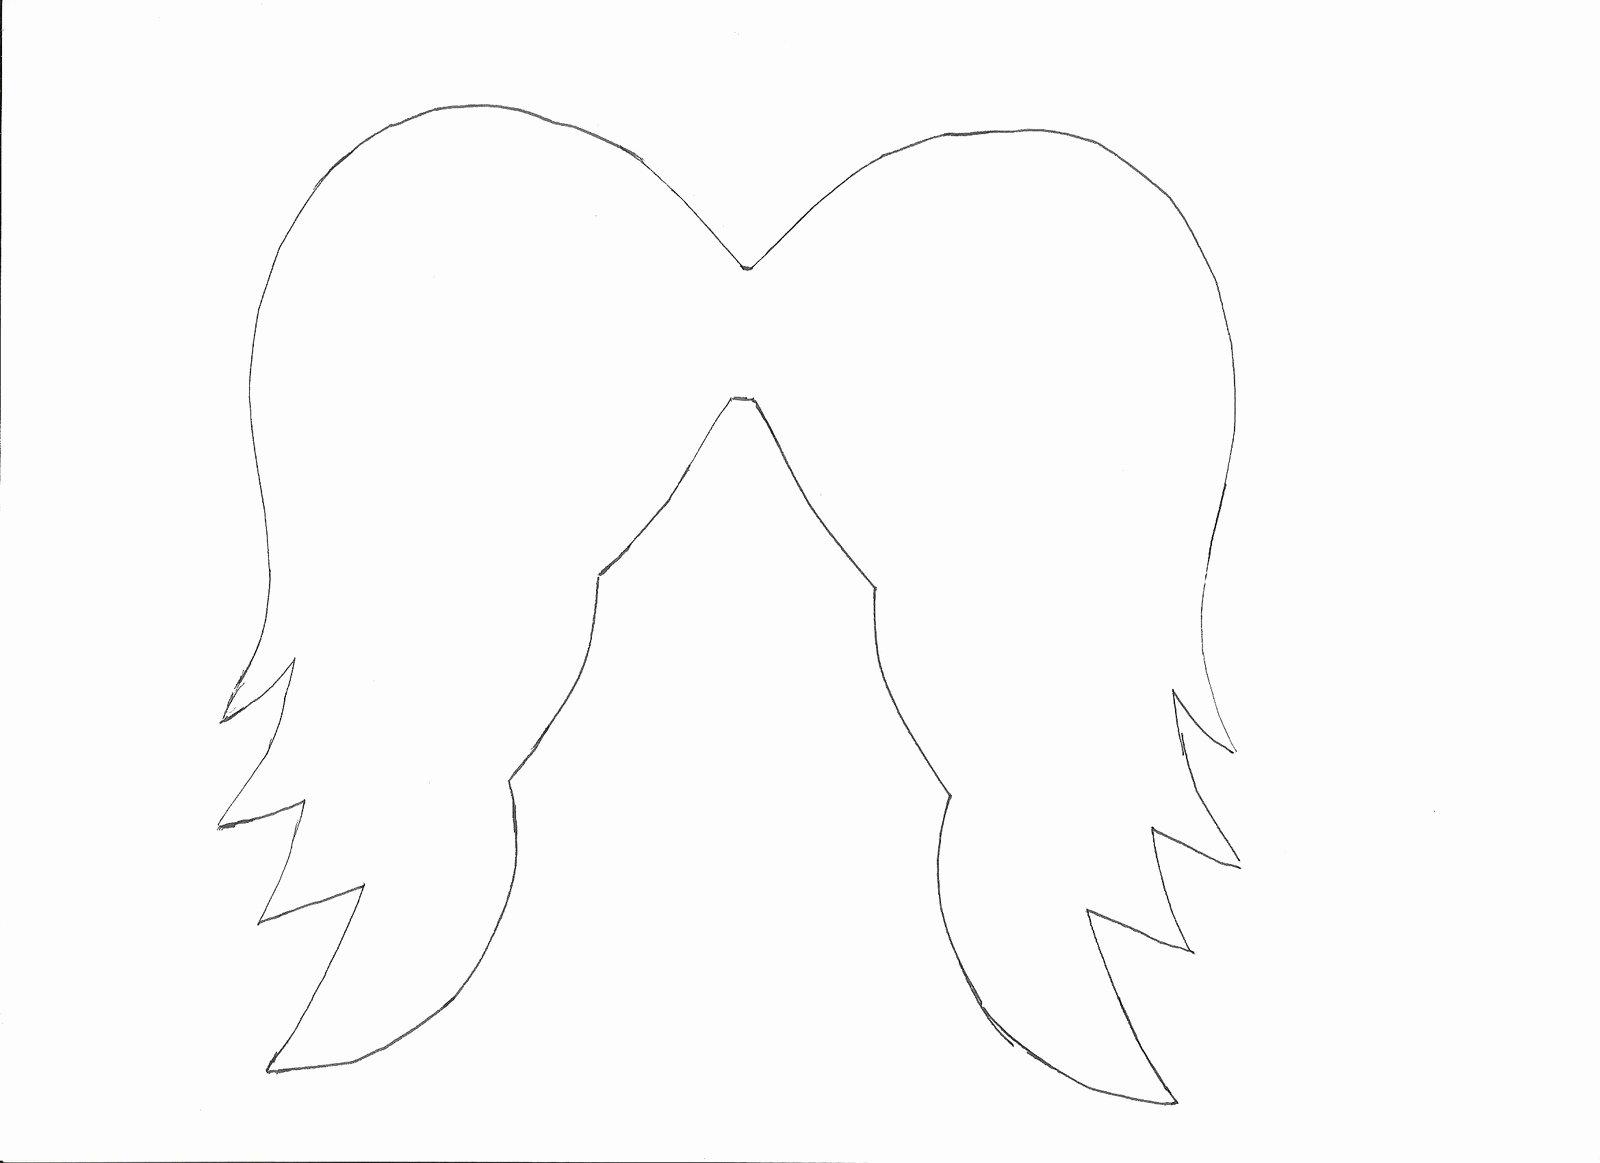 Angel Wing Templates Printable Elegant the Nest Paper Angel Wings